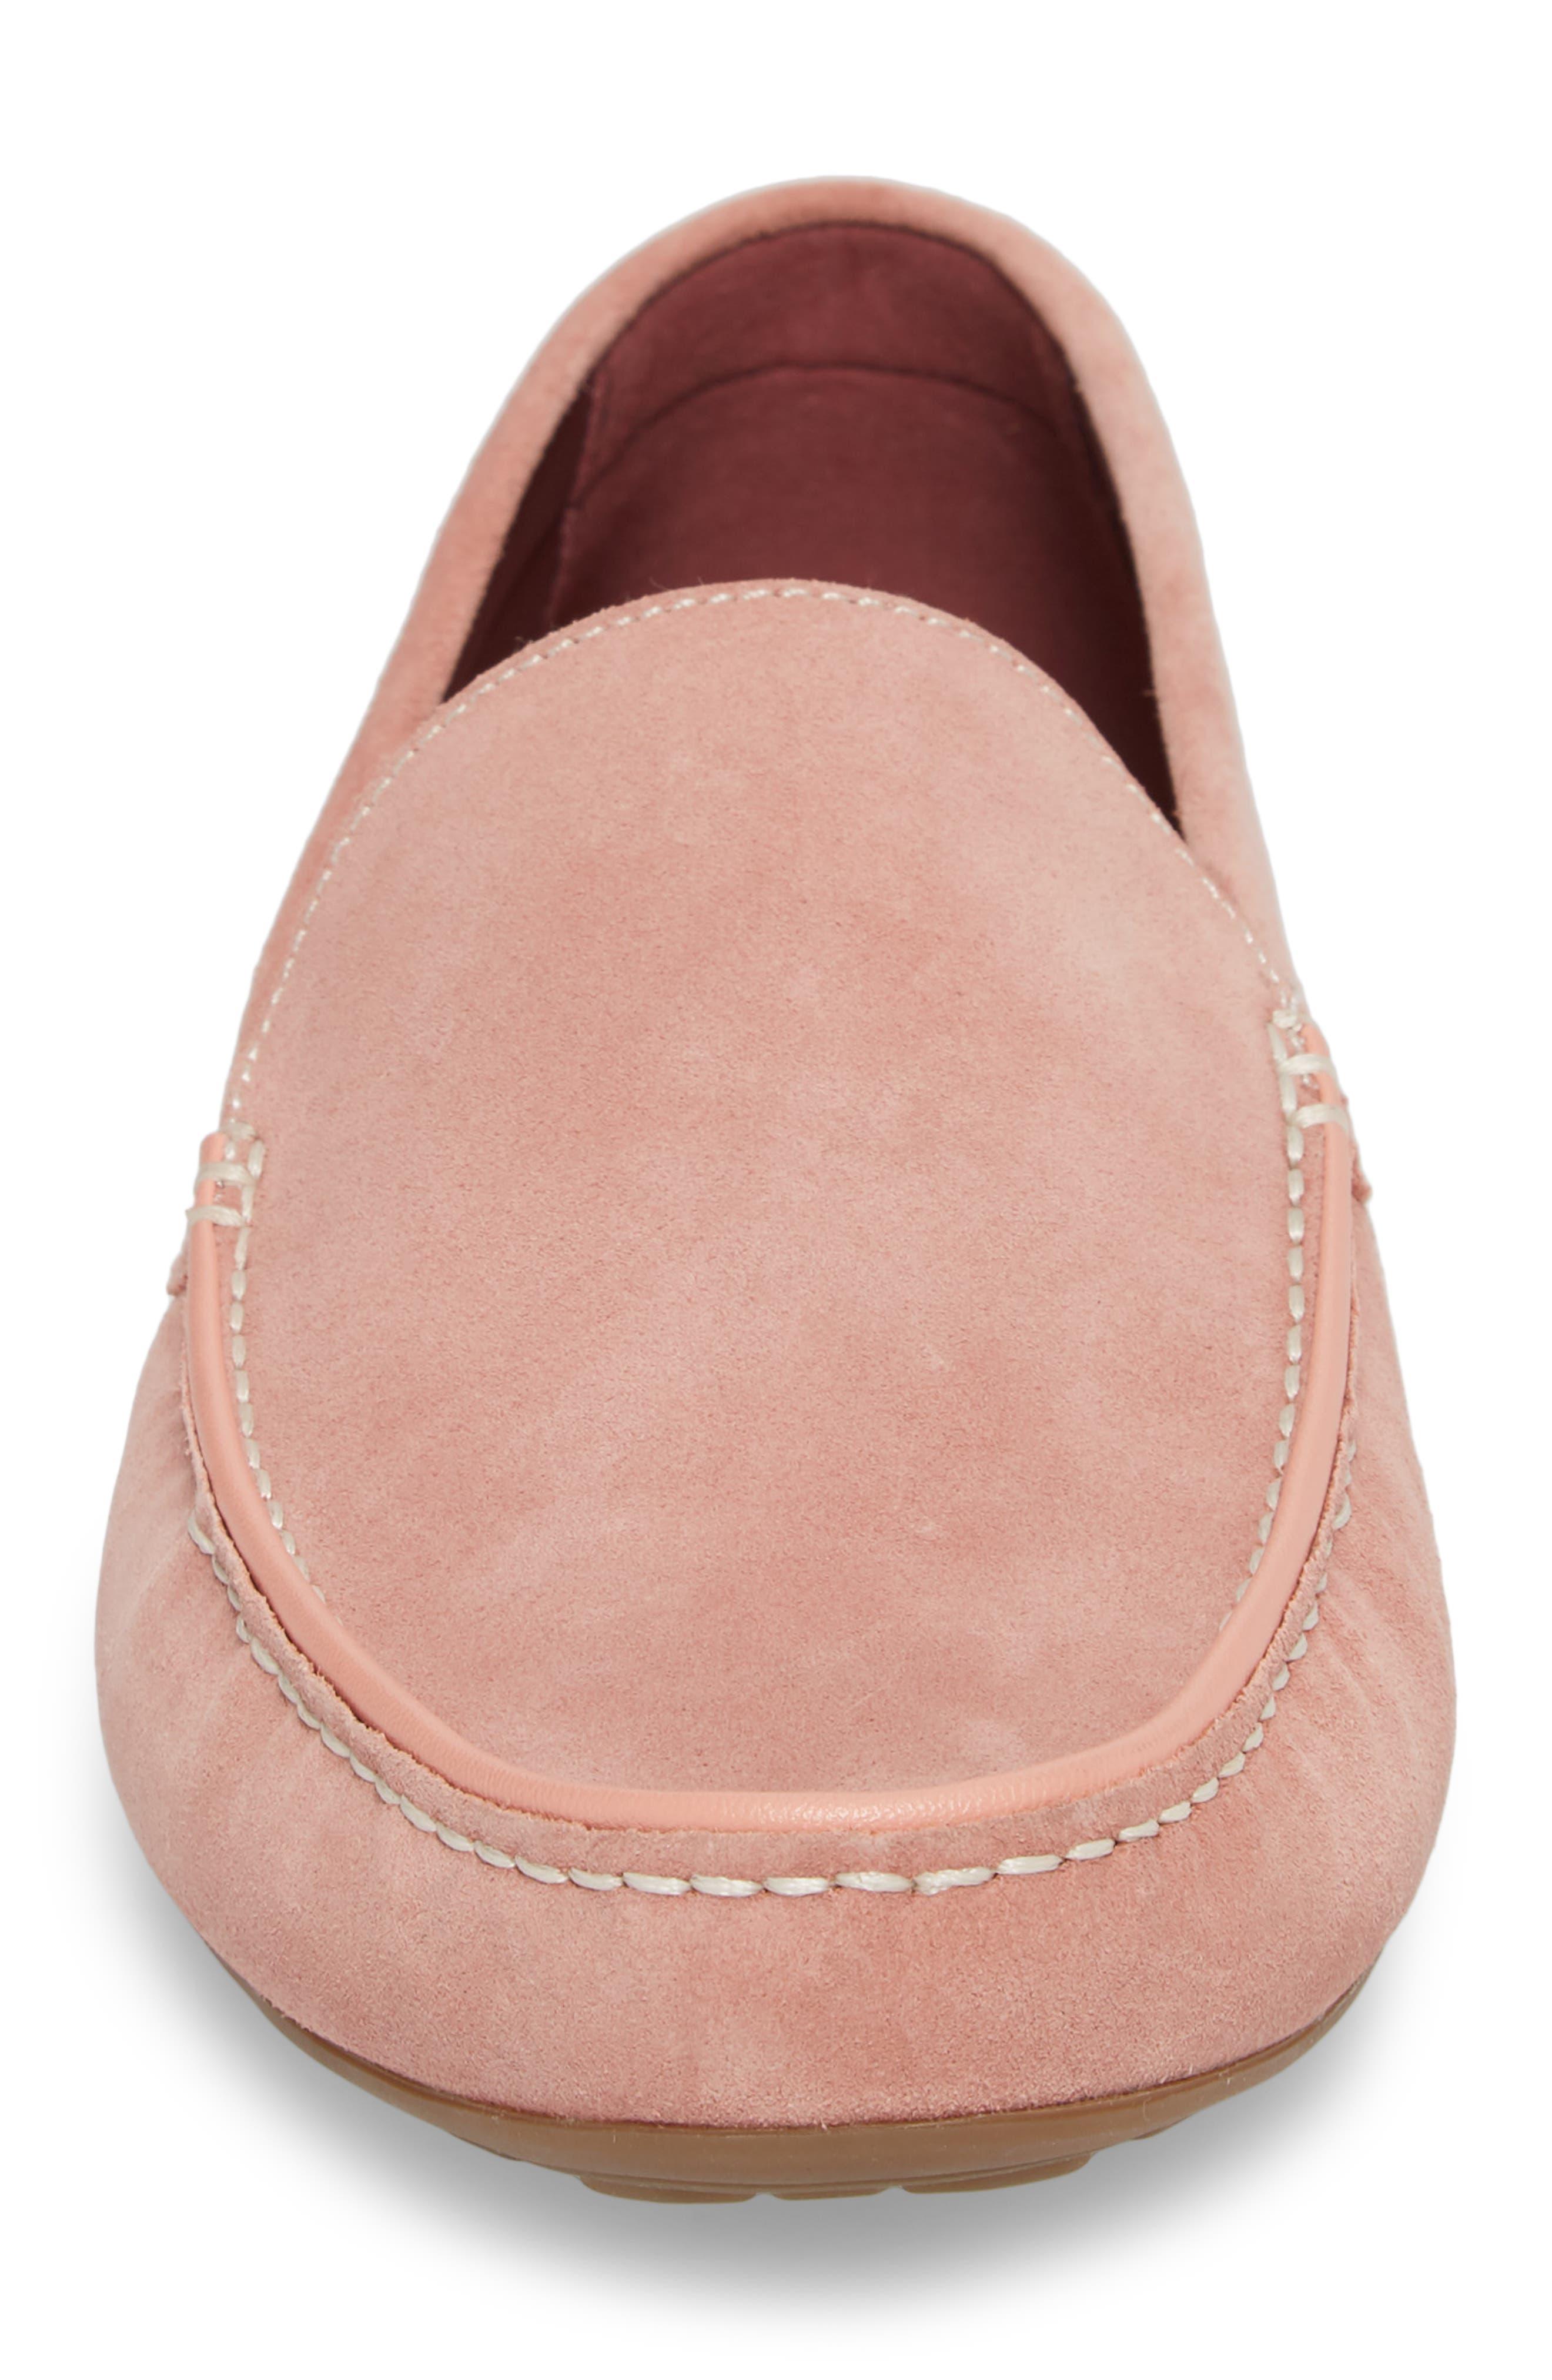 Leroy Driver Shoe,                             Alternate thumbnail 4, color,                             Blush